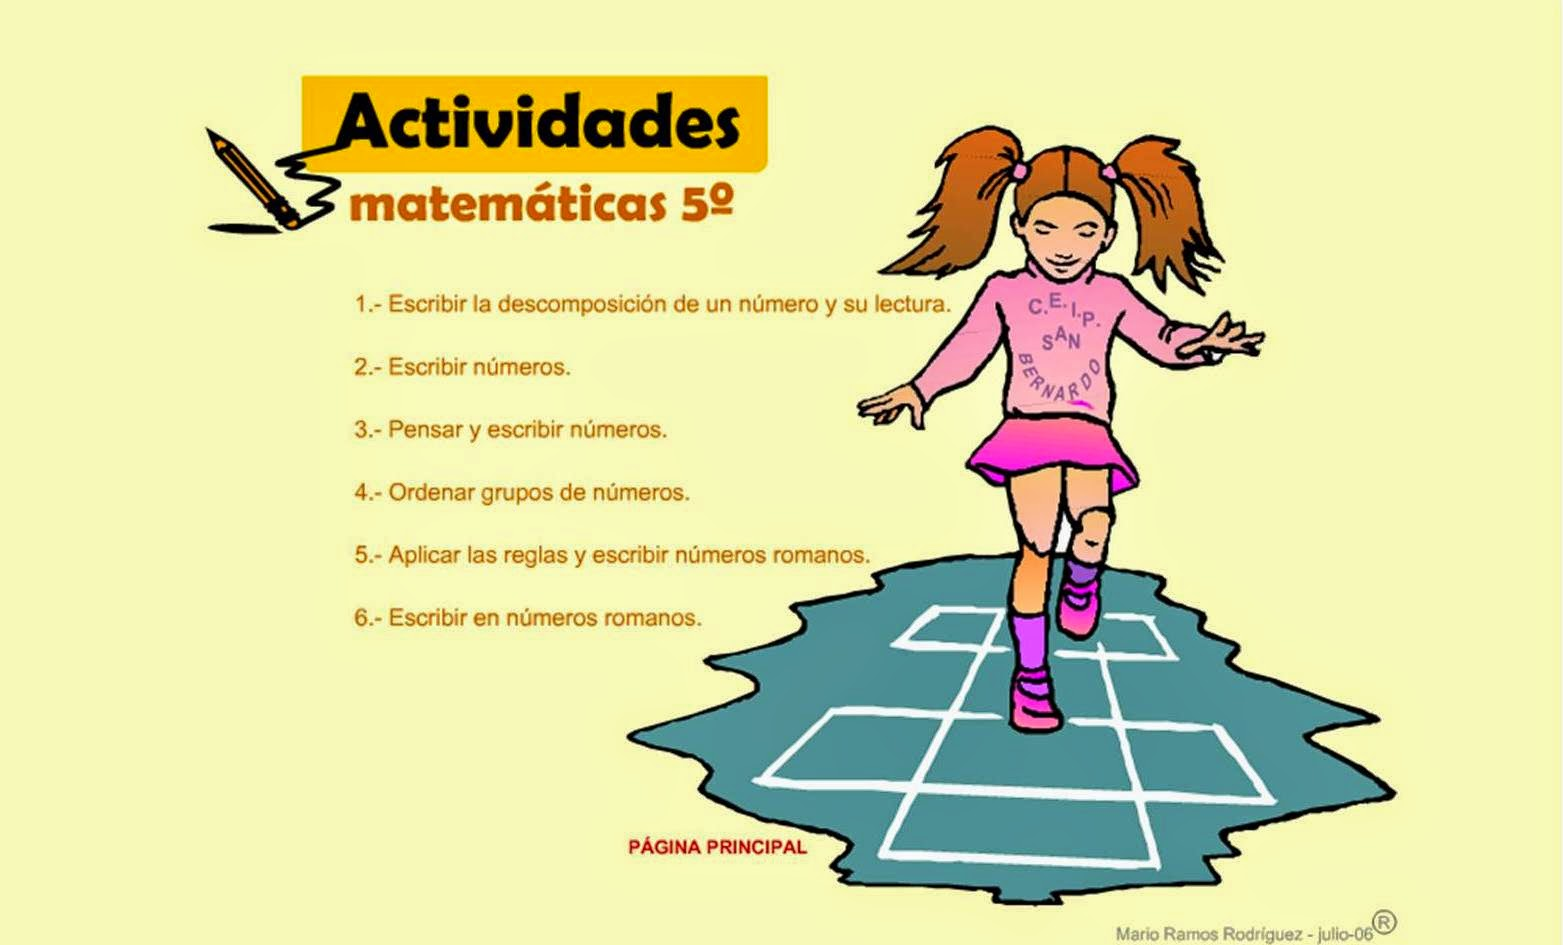 http://www3.gobiernodecanarias.org/medusa/eltanquematematico/todo_mate/actividades5/tema1_5_p.html?utm_source=tiching&utm_medium=referral